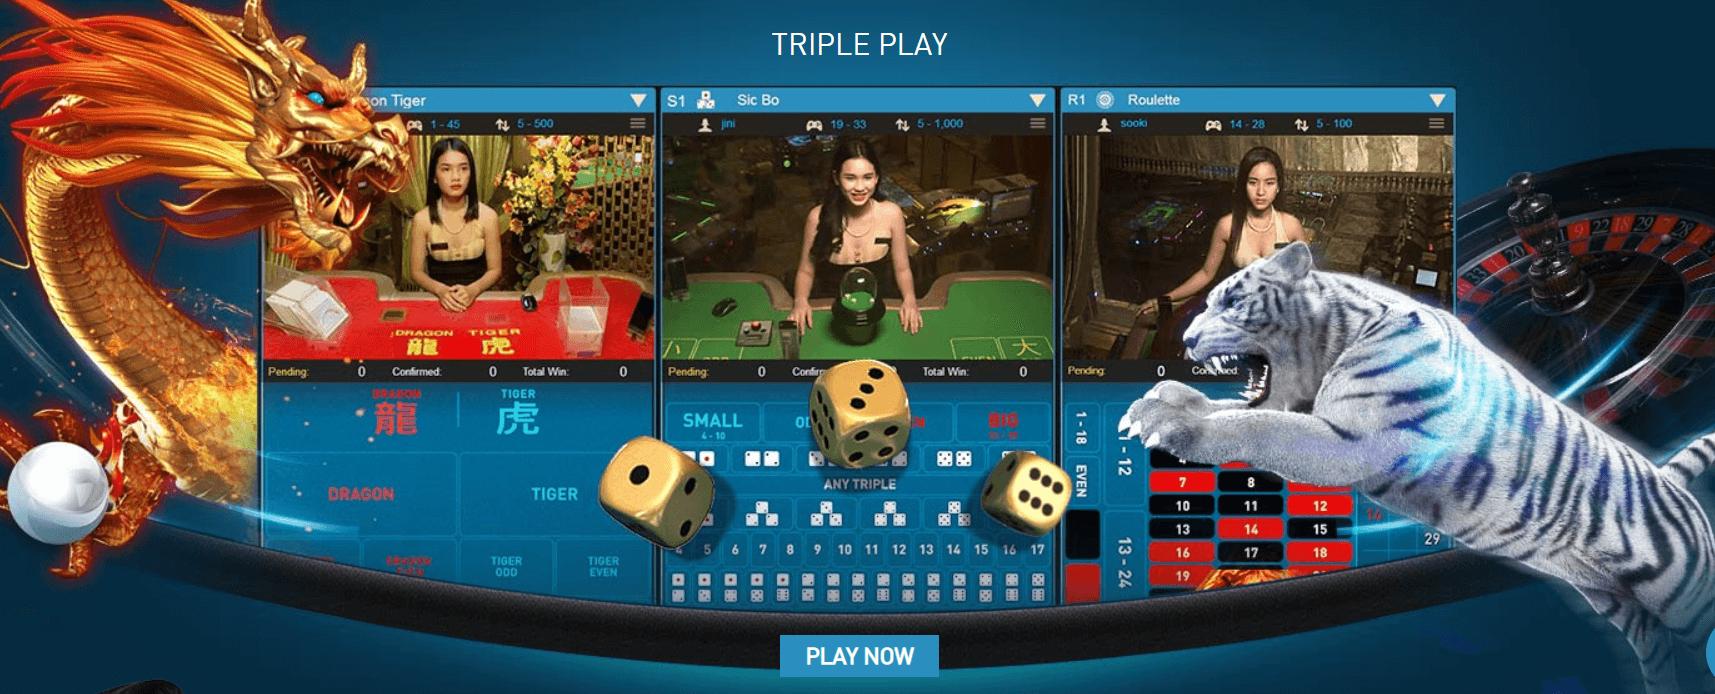 Live-casino-Triple-play